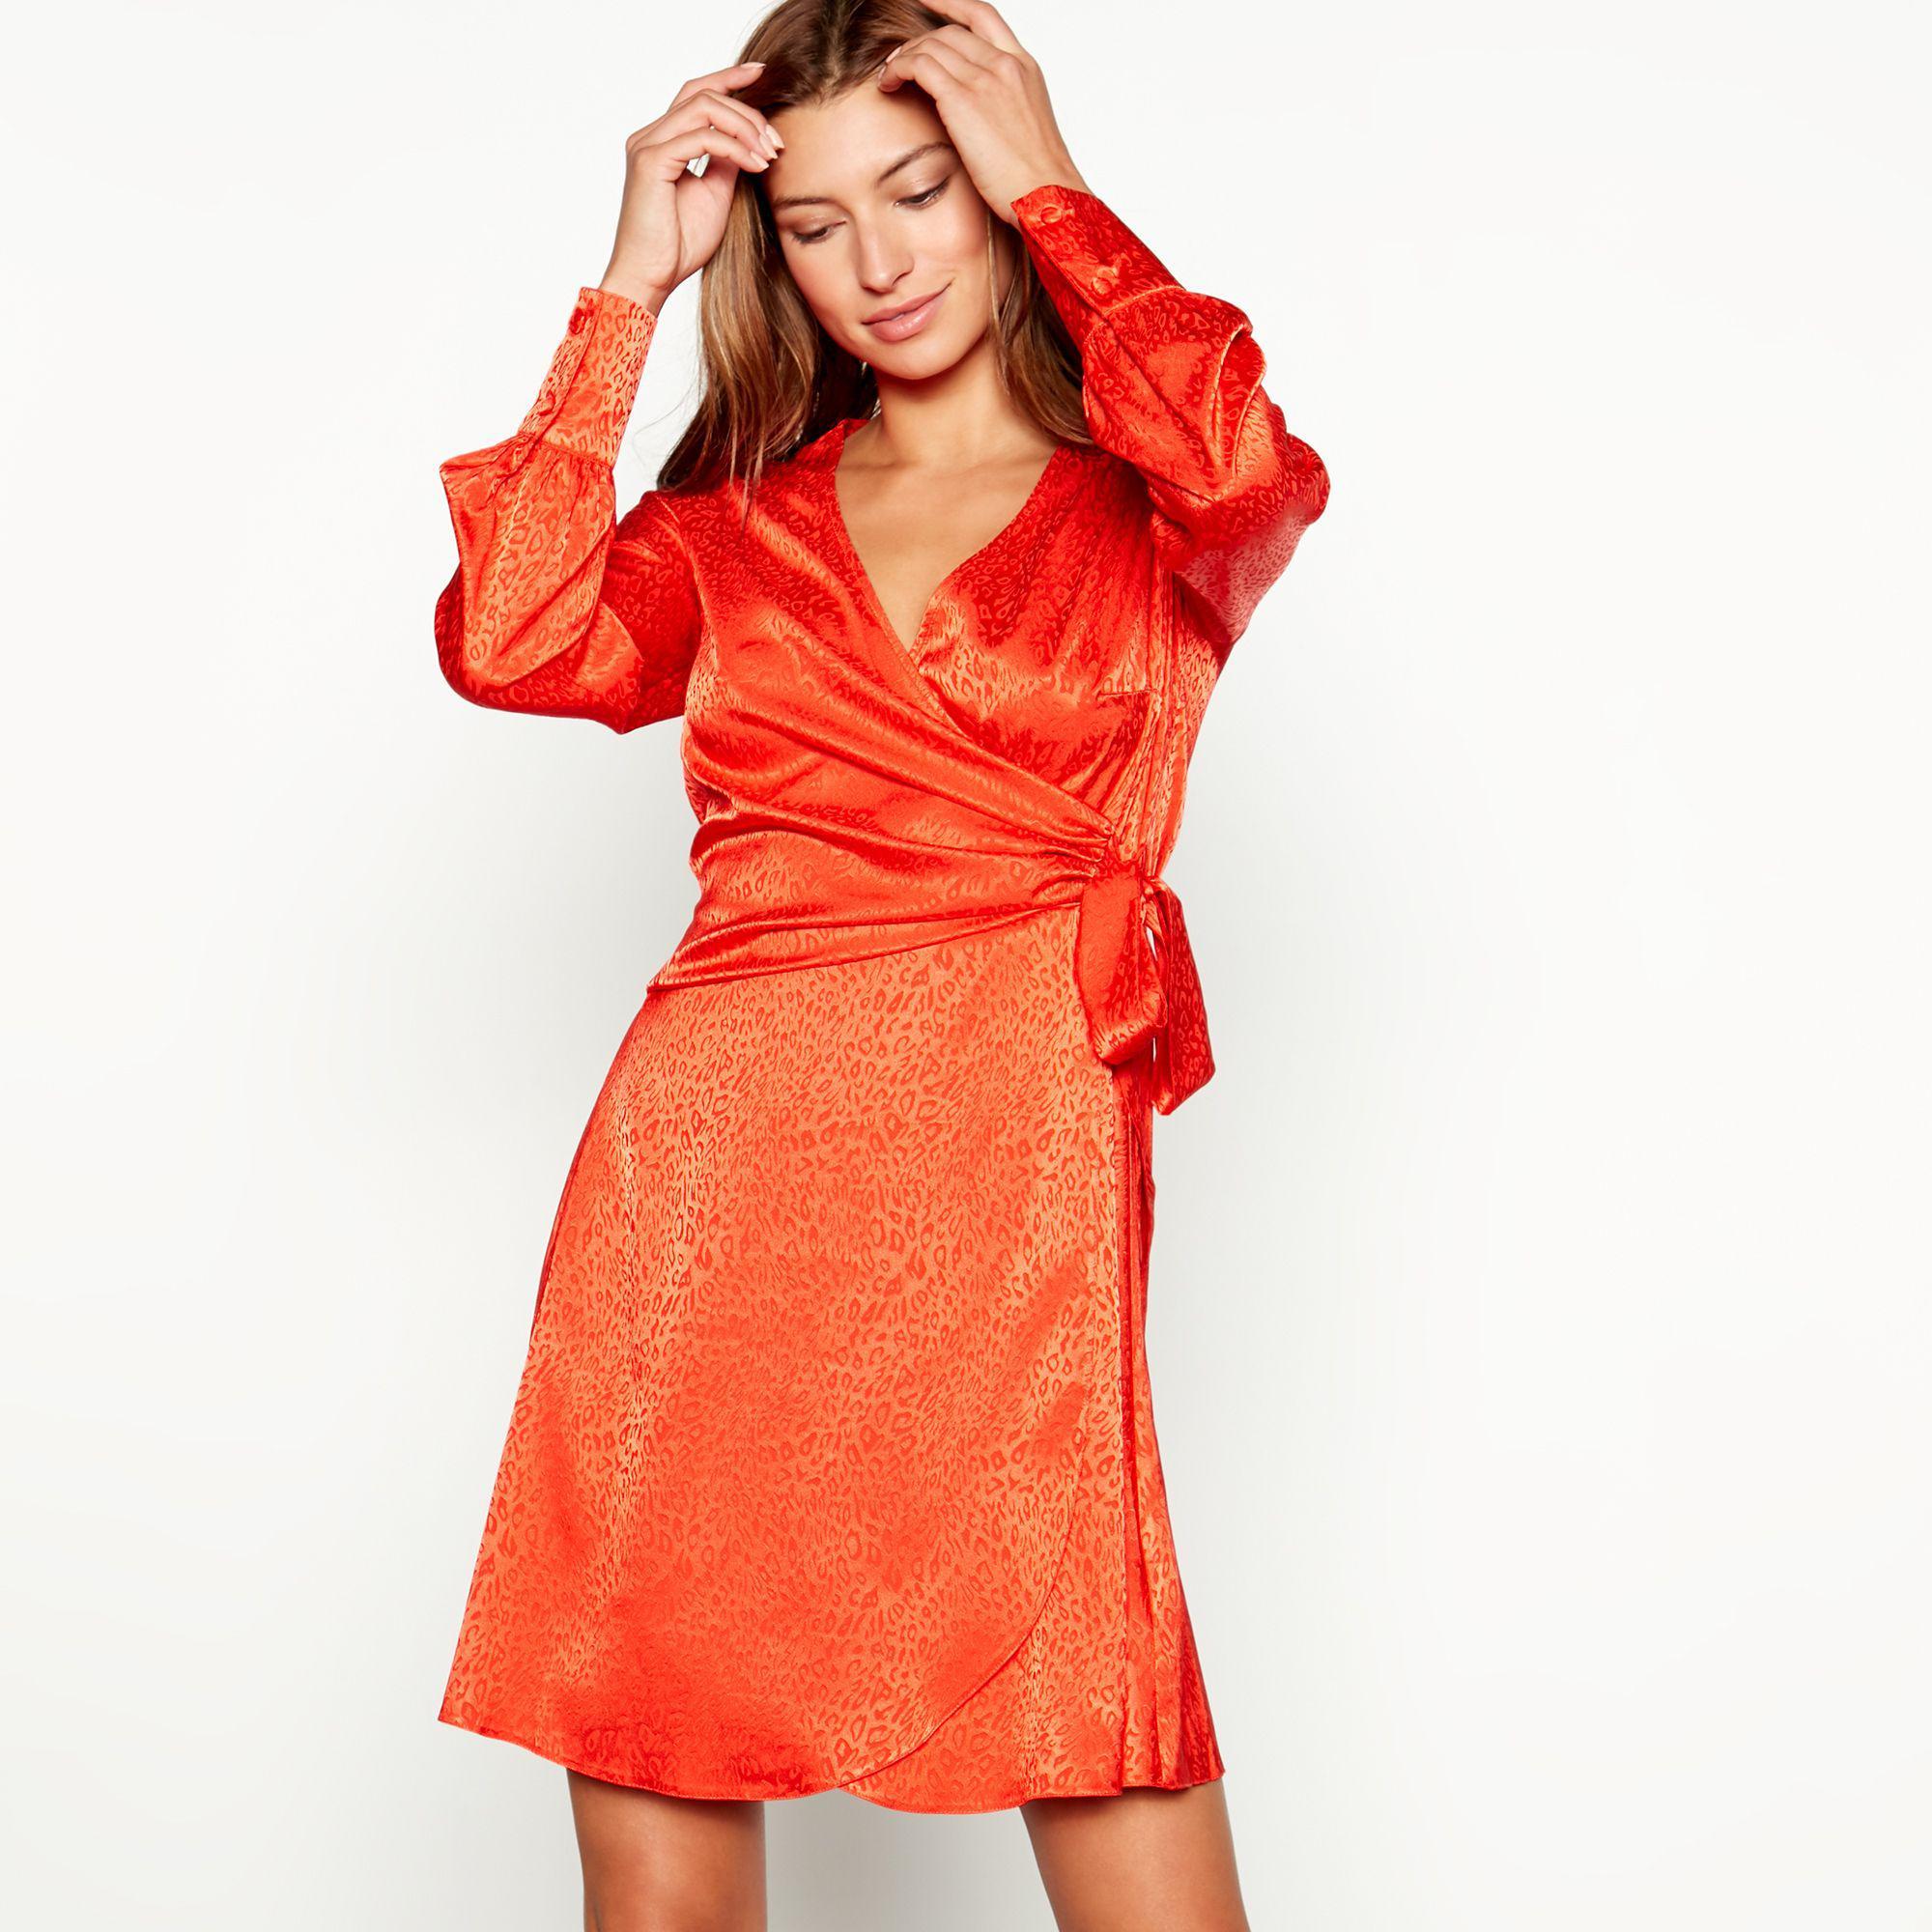 Red Herring Leopard Print Long Sleeve V-neck Mini Dress in Orange - Lyst 5a583120f